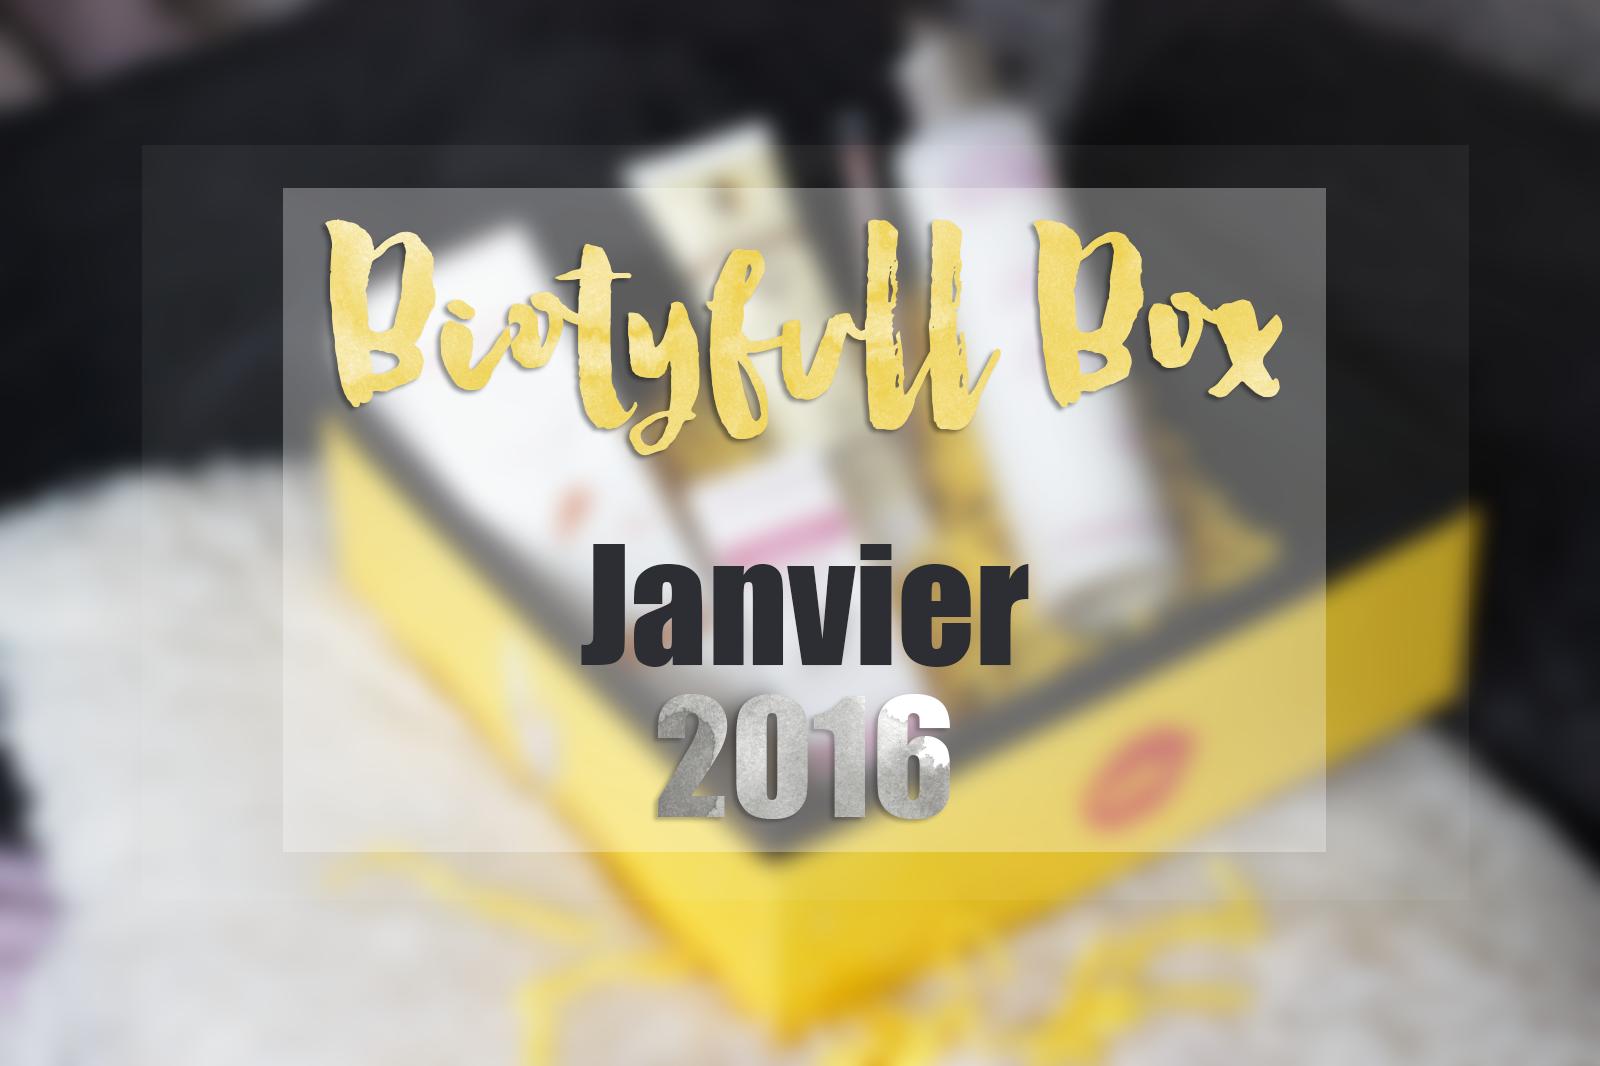 Biotyfull Box - Janvier 2016